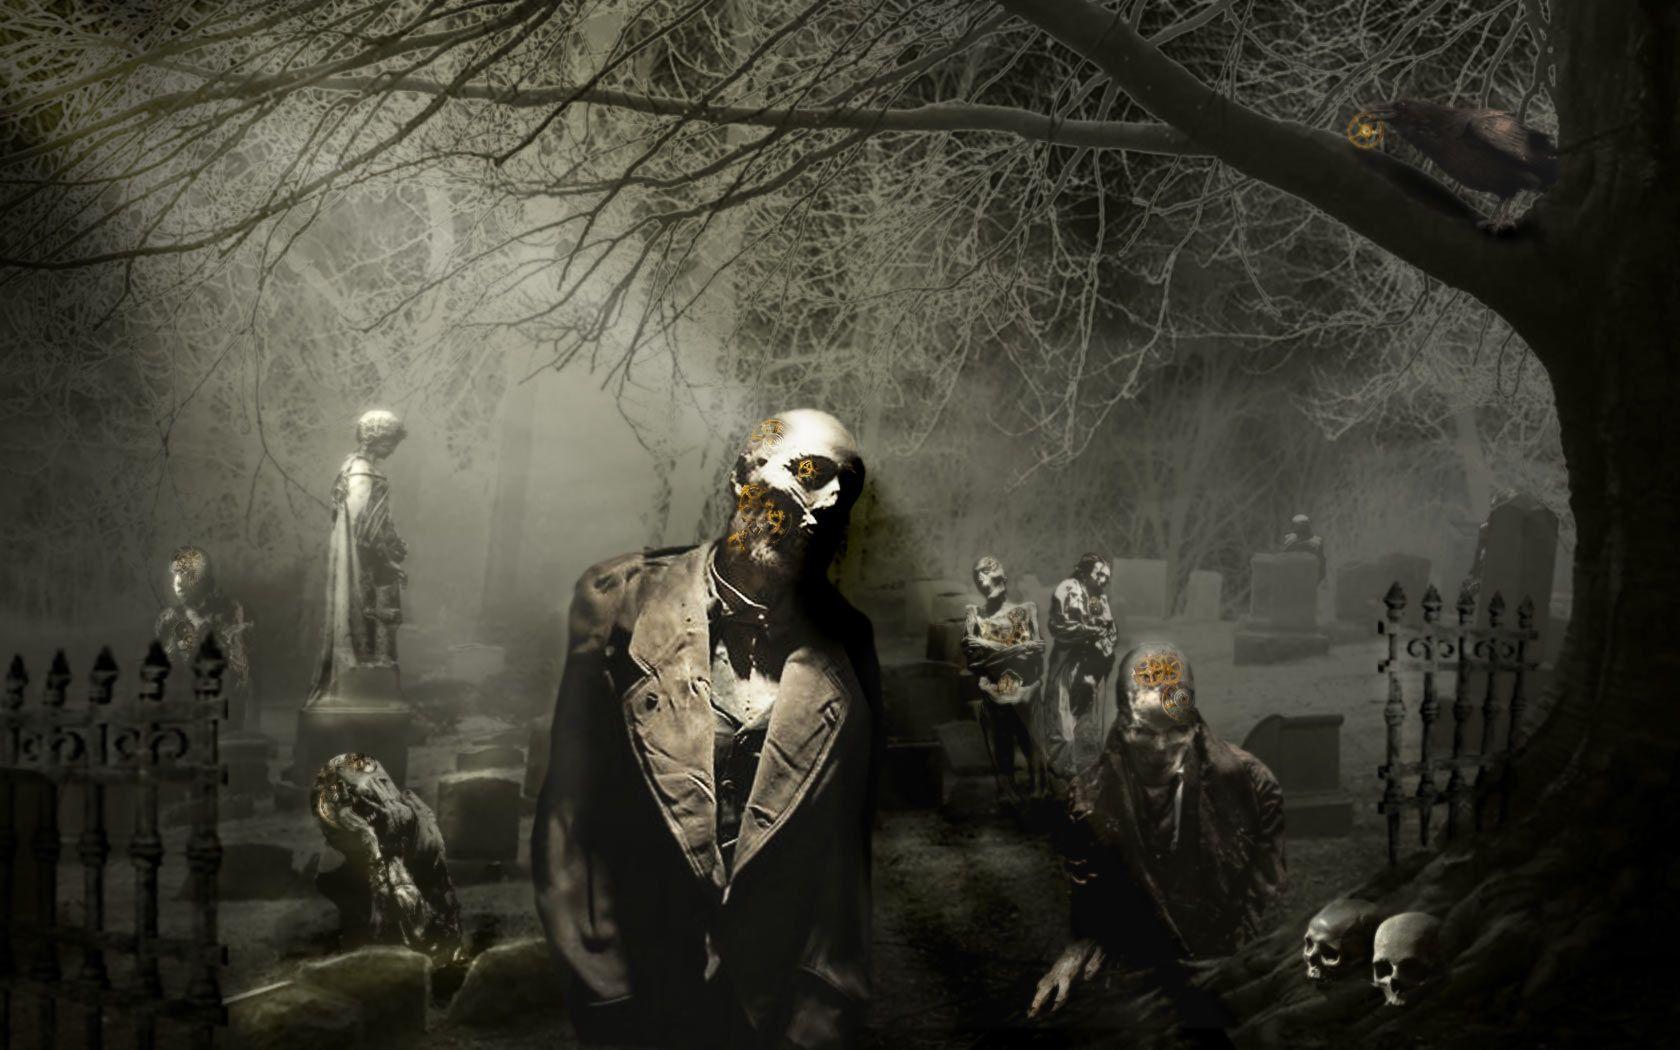 Most Inspiring Wallpaper Halloween Unique - f0c097906f863928b41f1632eba8d2b9  Image_152118.jpg